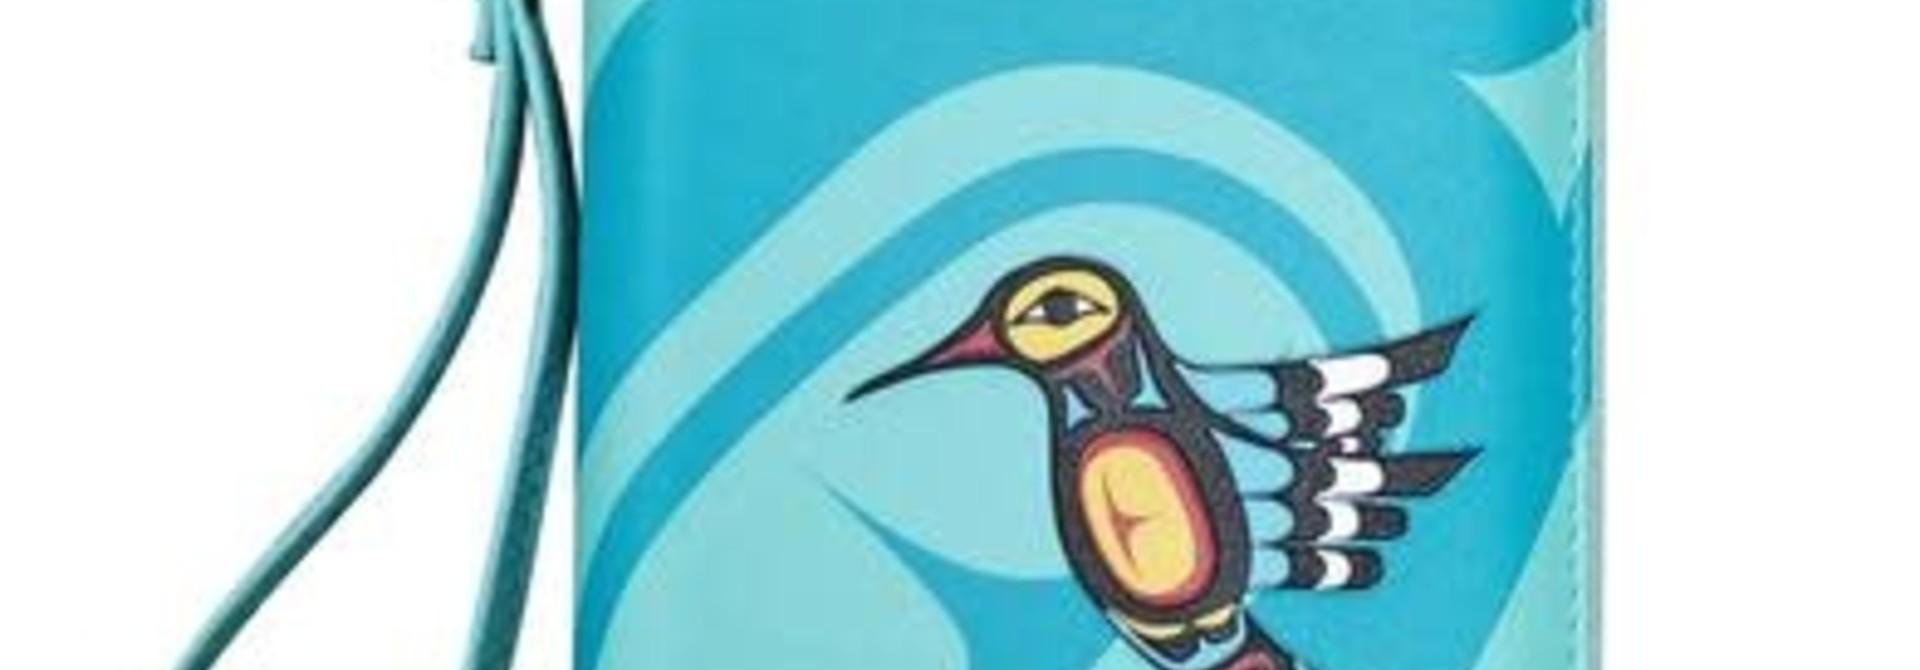 Travel Wallet-Hummingbird by Francis Dick